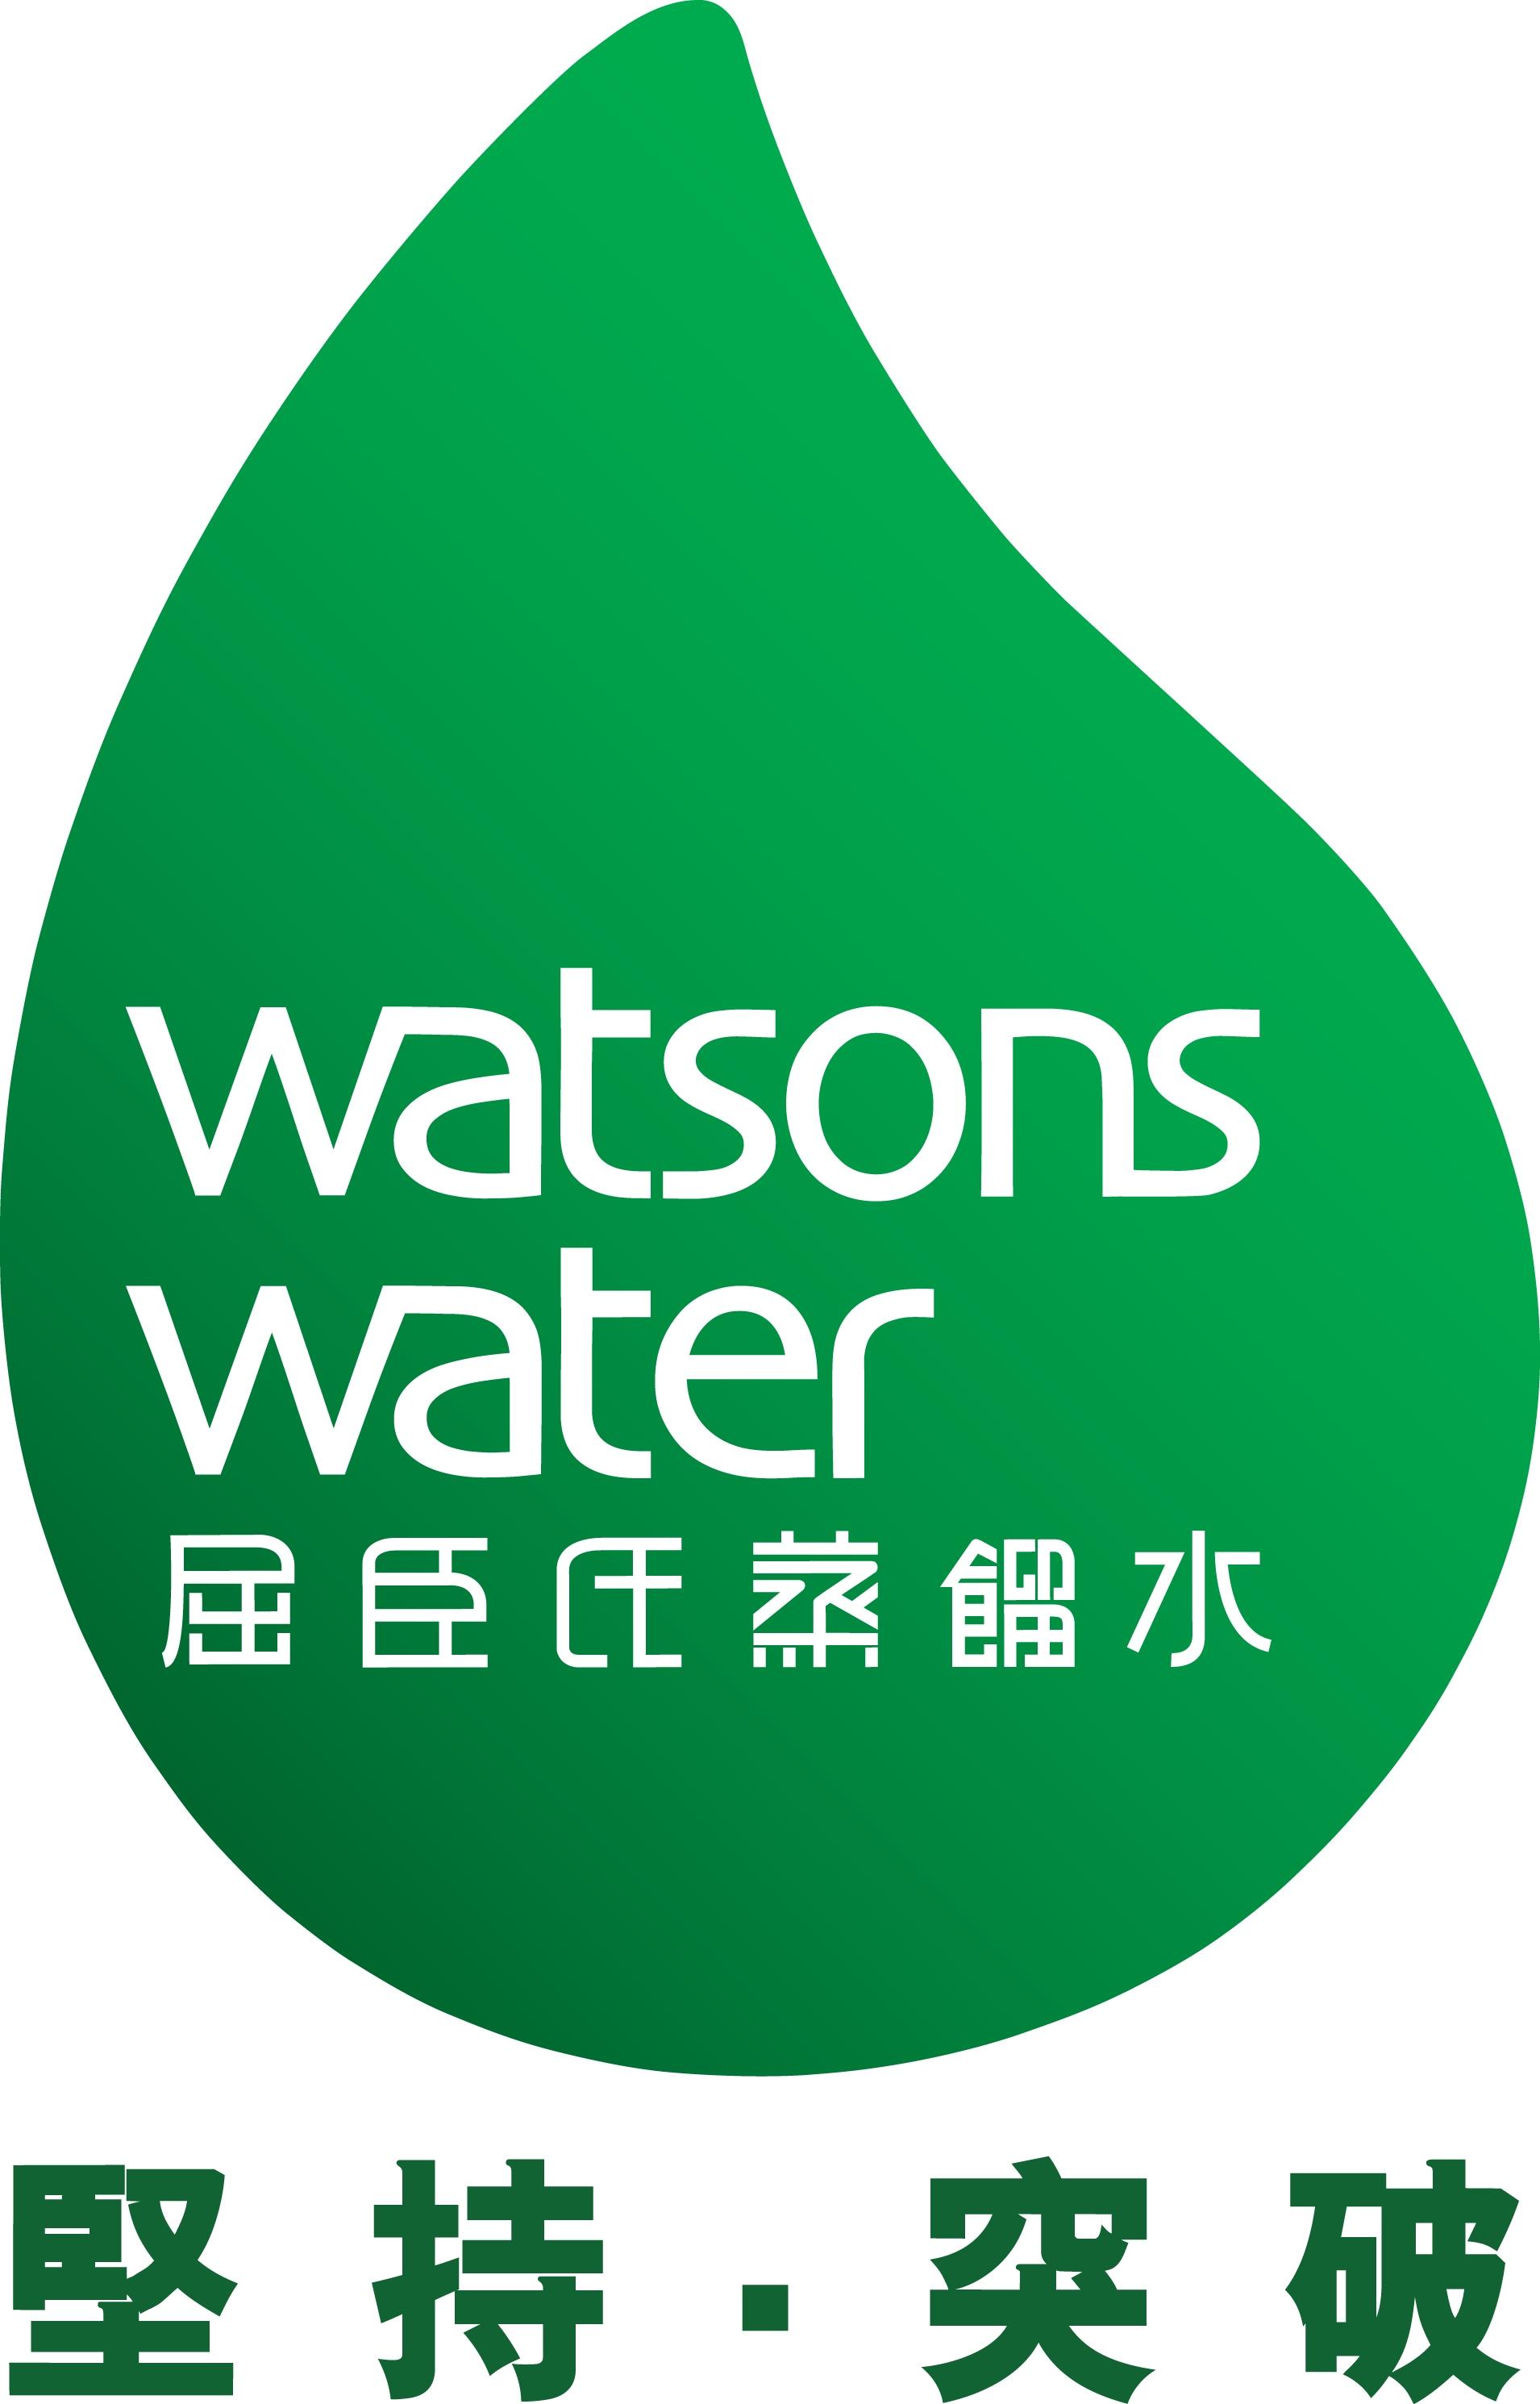 Watsons Water new logo_persistency breakthrough